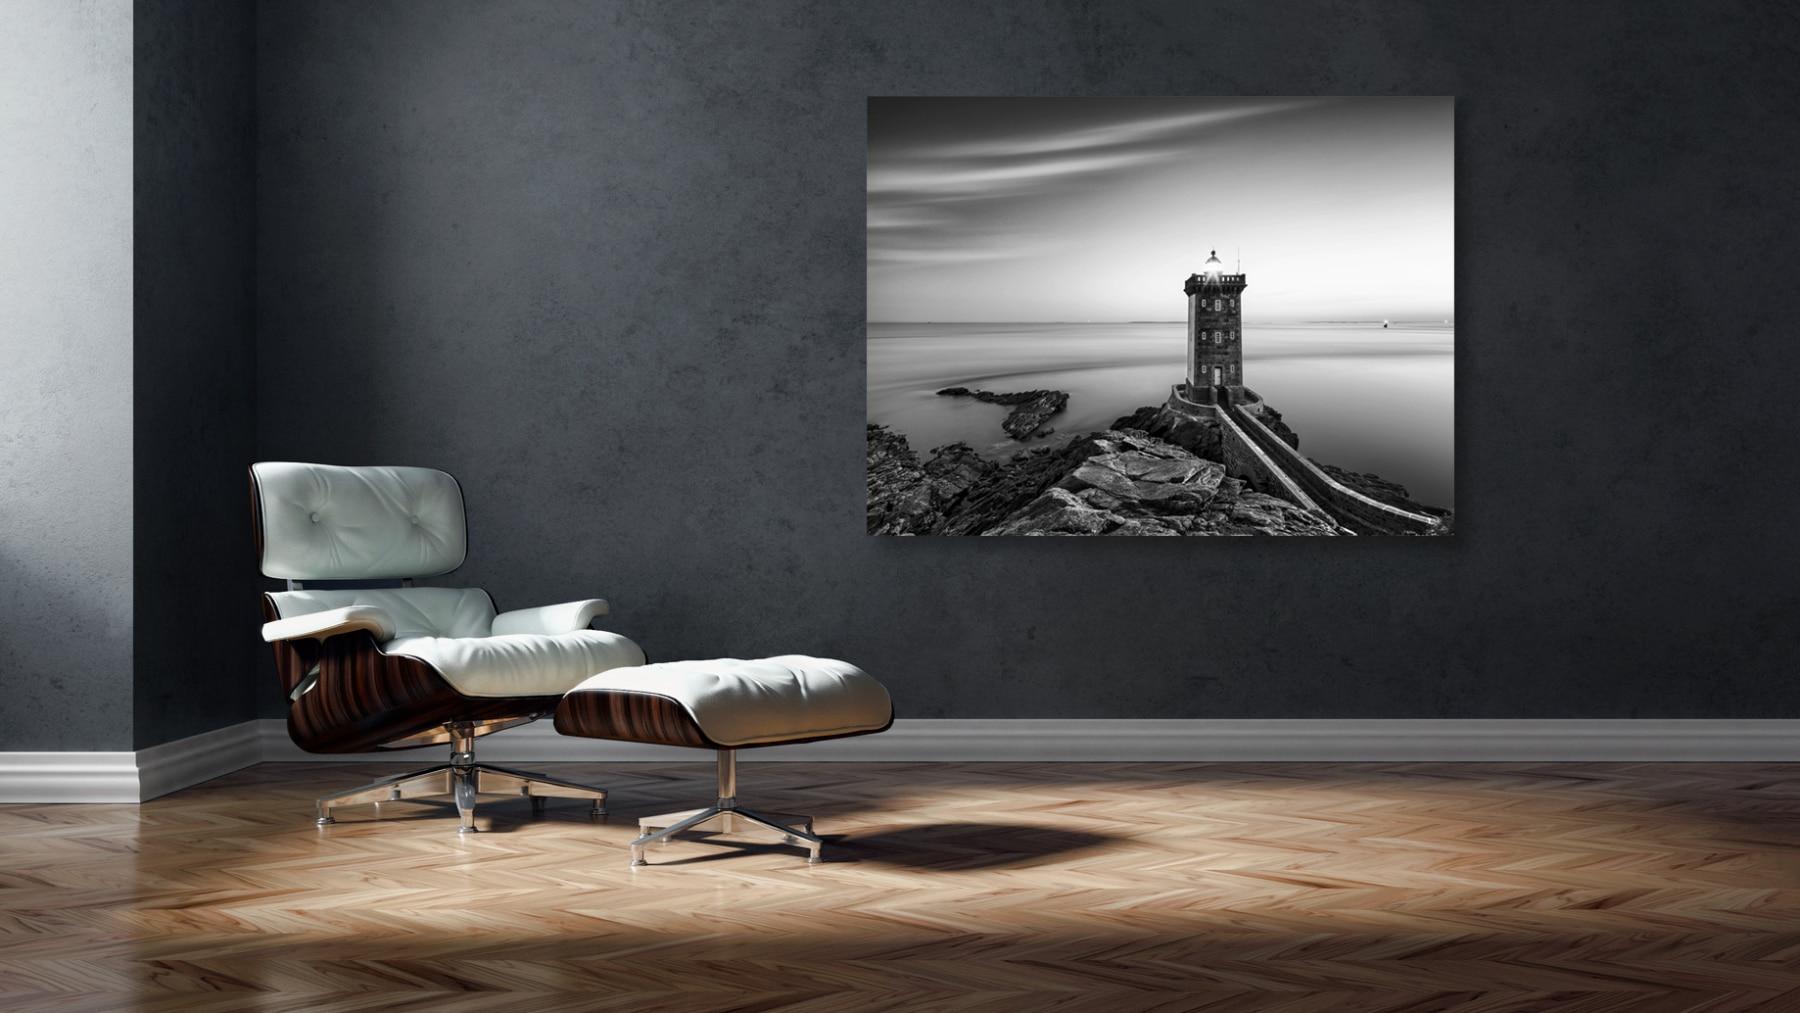 France, Brittany, Lighthouse, Le Conquet, Phare de Kermorvan